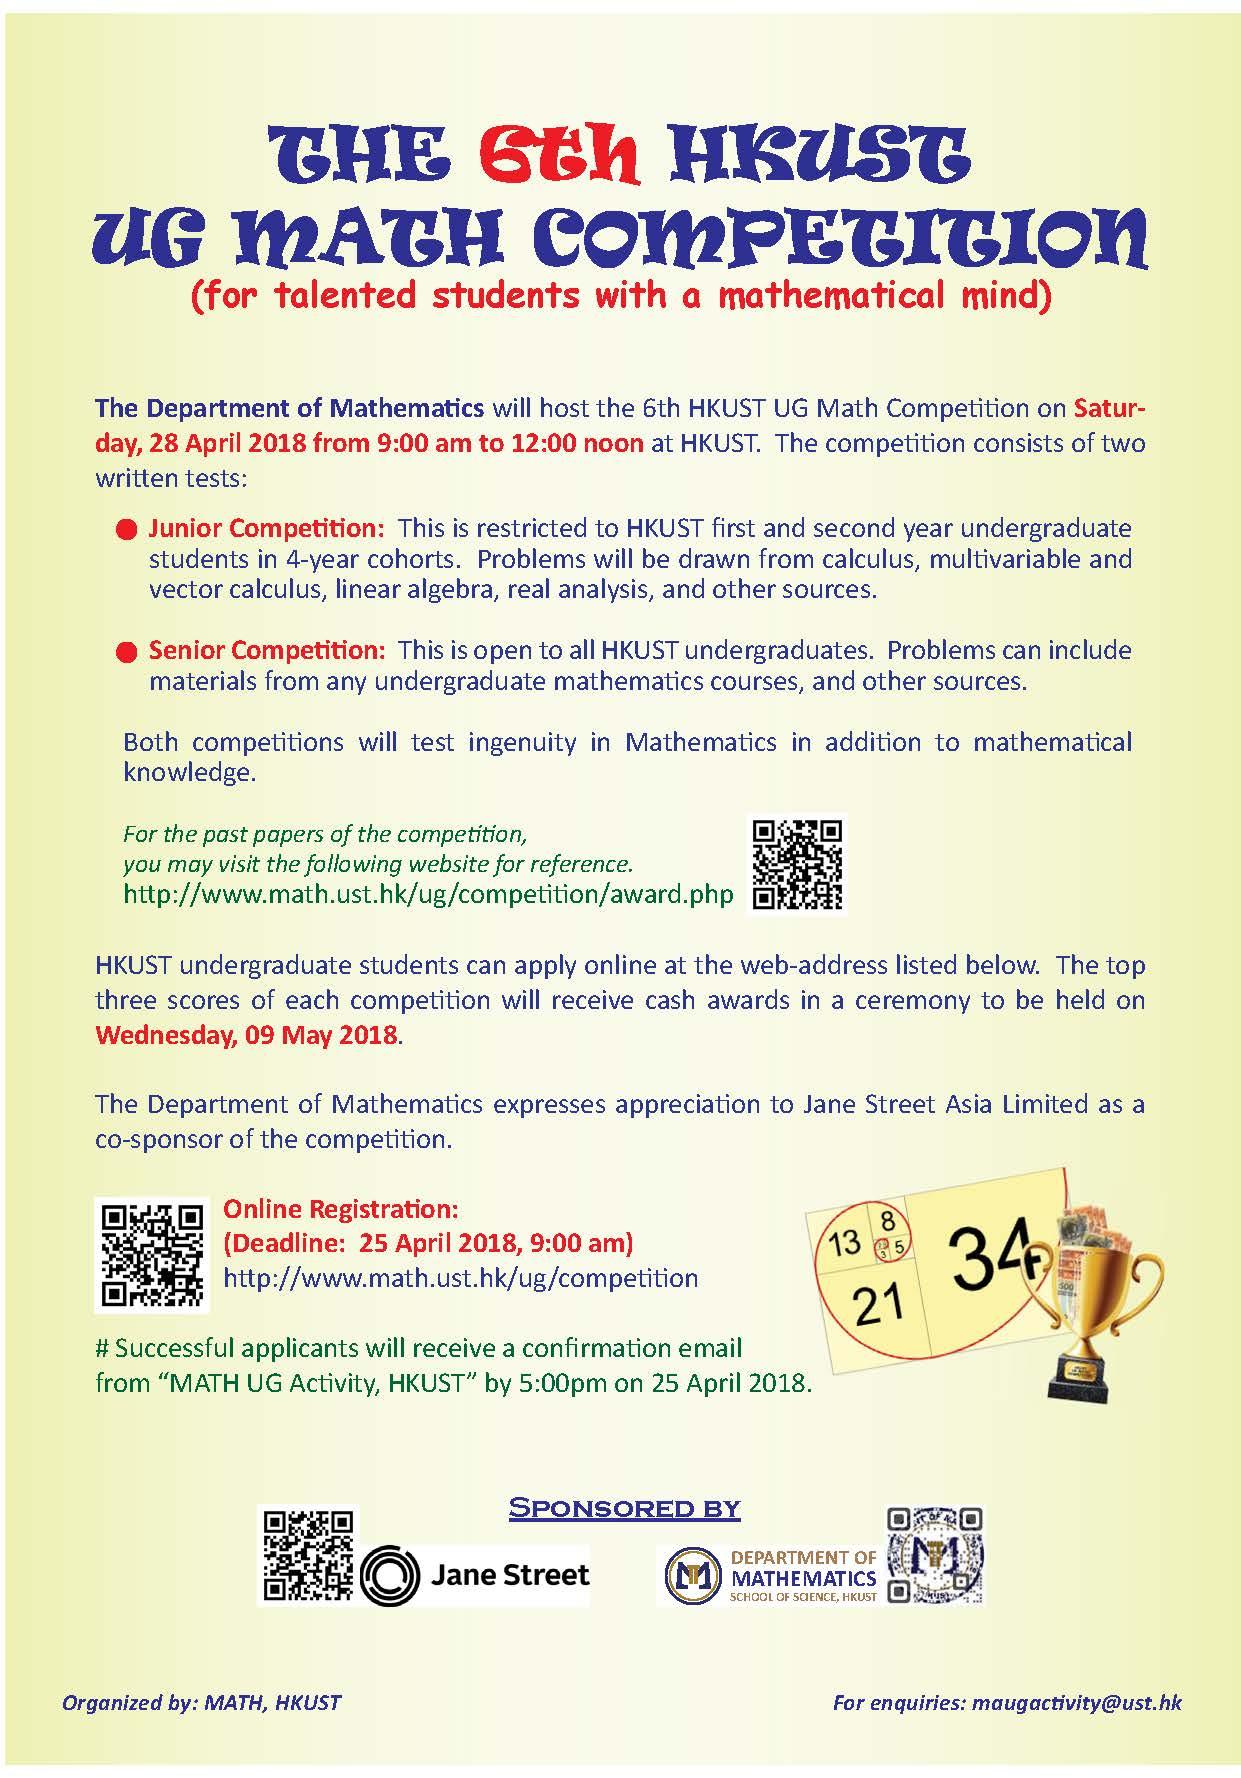 Department of Mathematics, Hong Kong University of Science & Technology